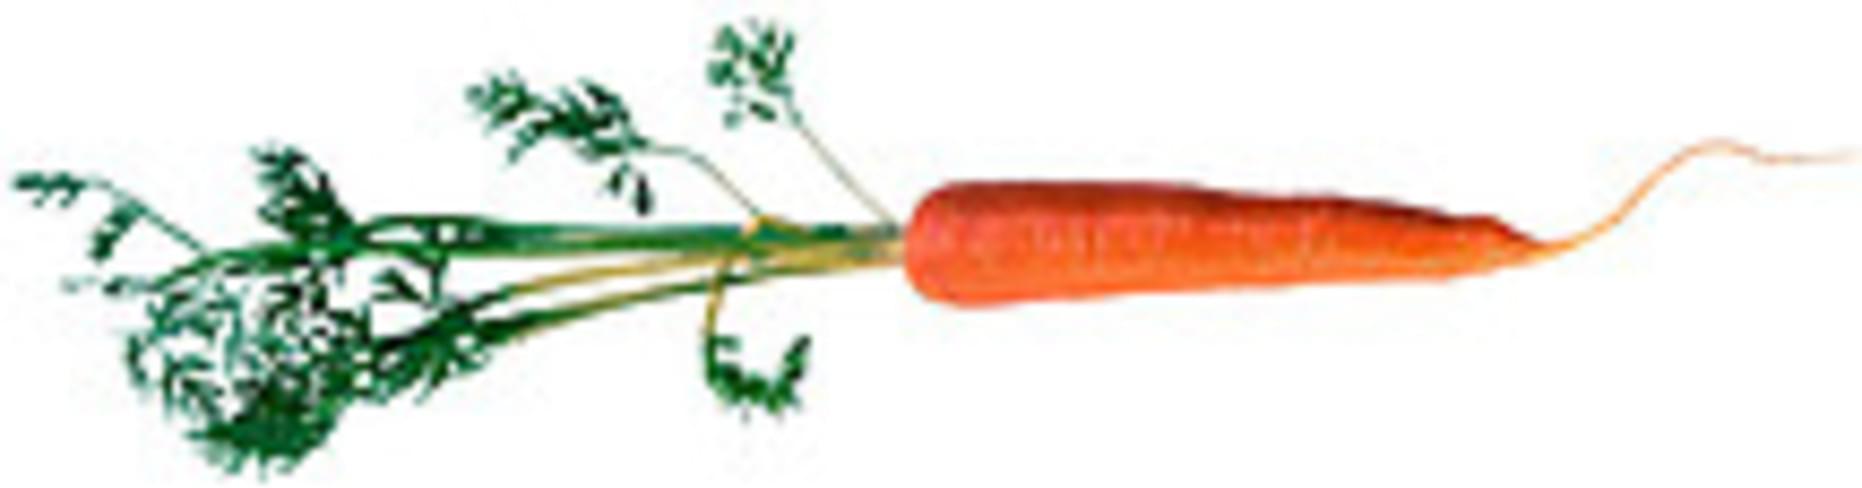 USDA Carrots - 1